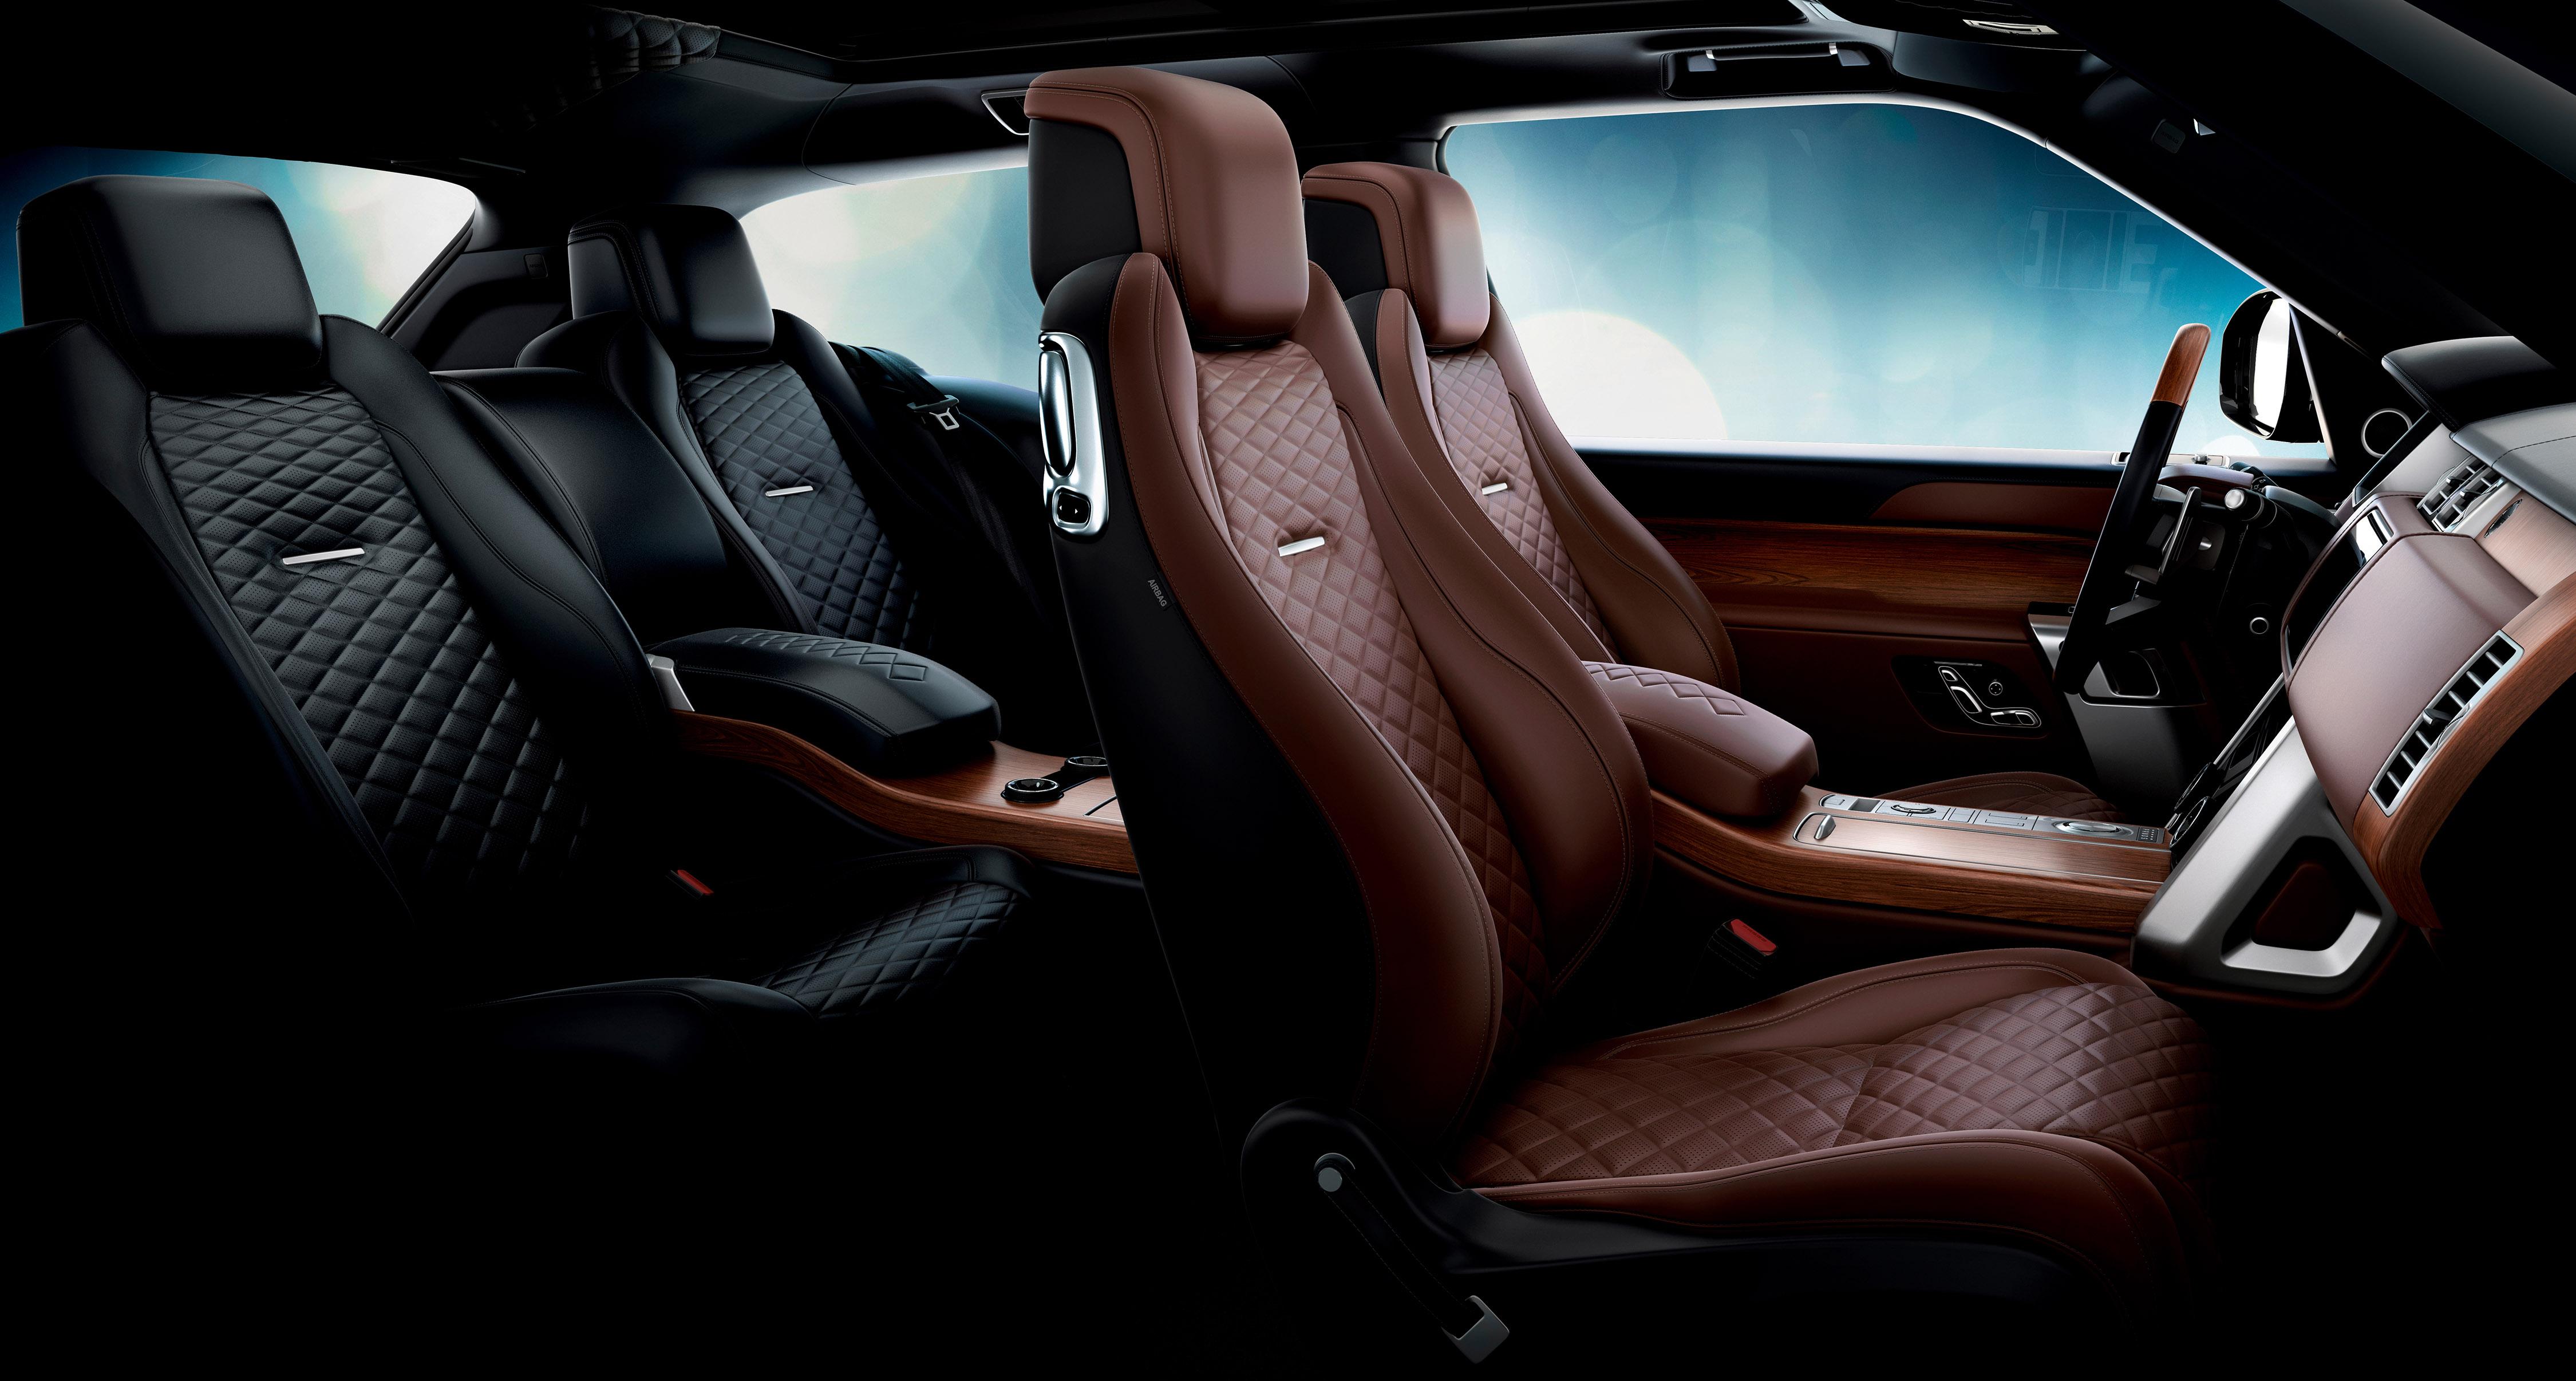 273744 07 range rover sv coupe 211d13 original 1519909259